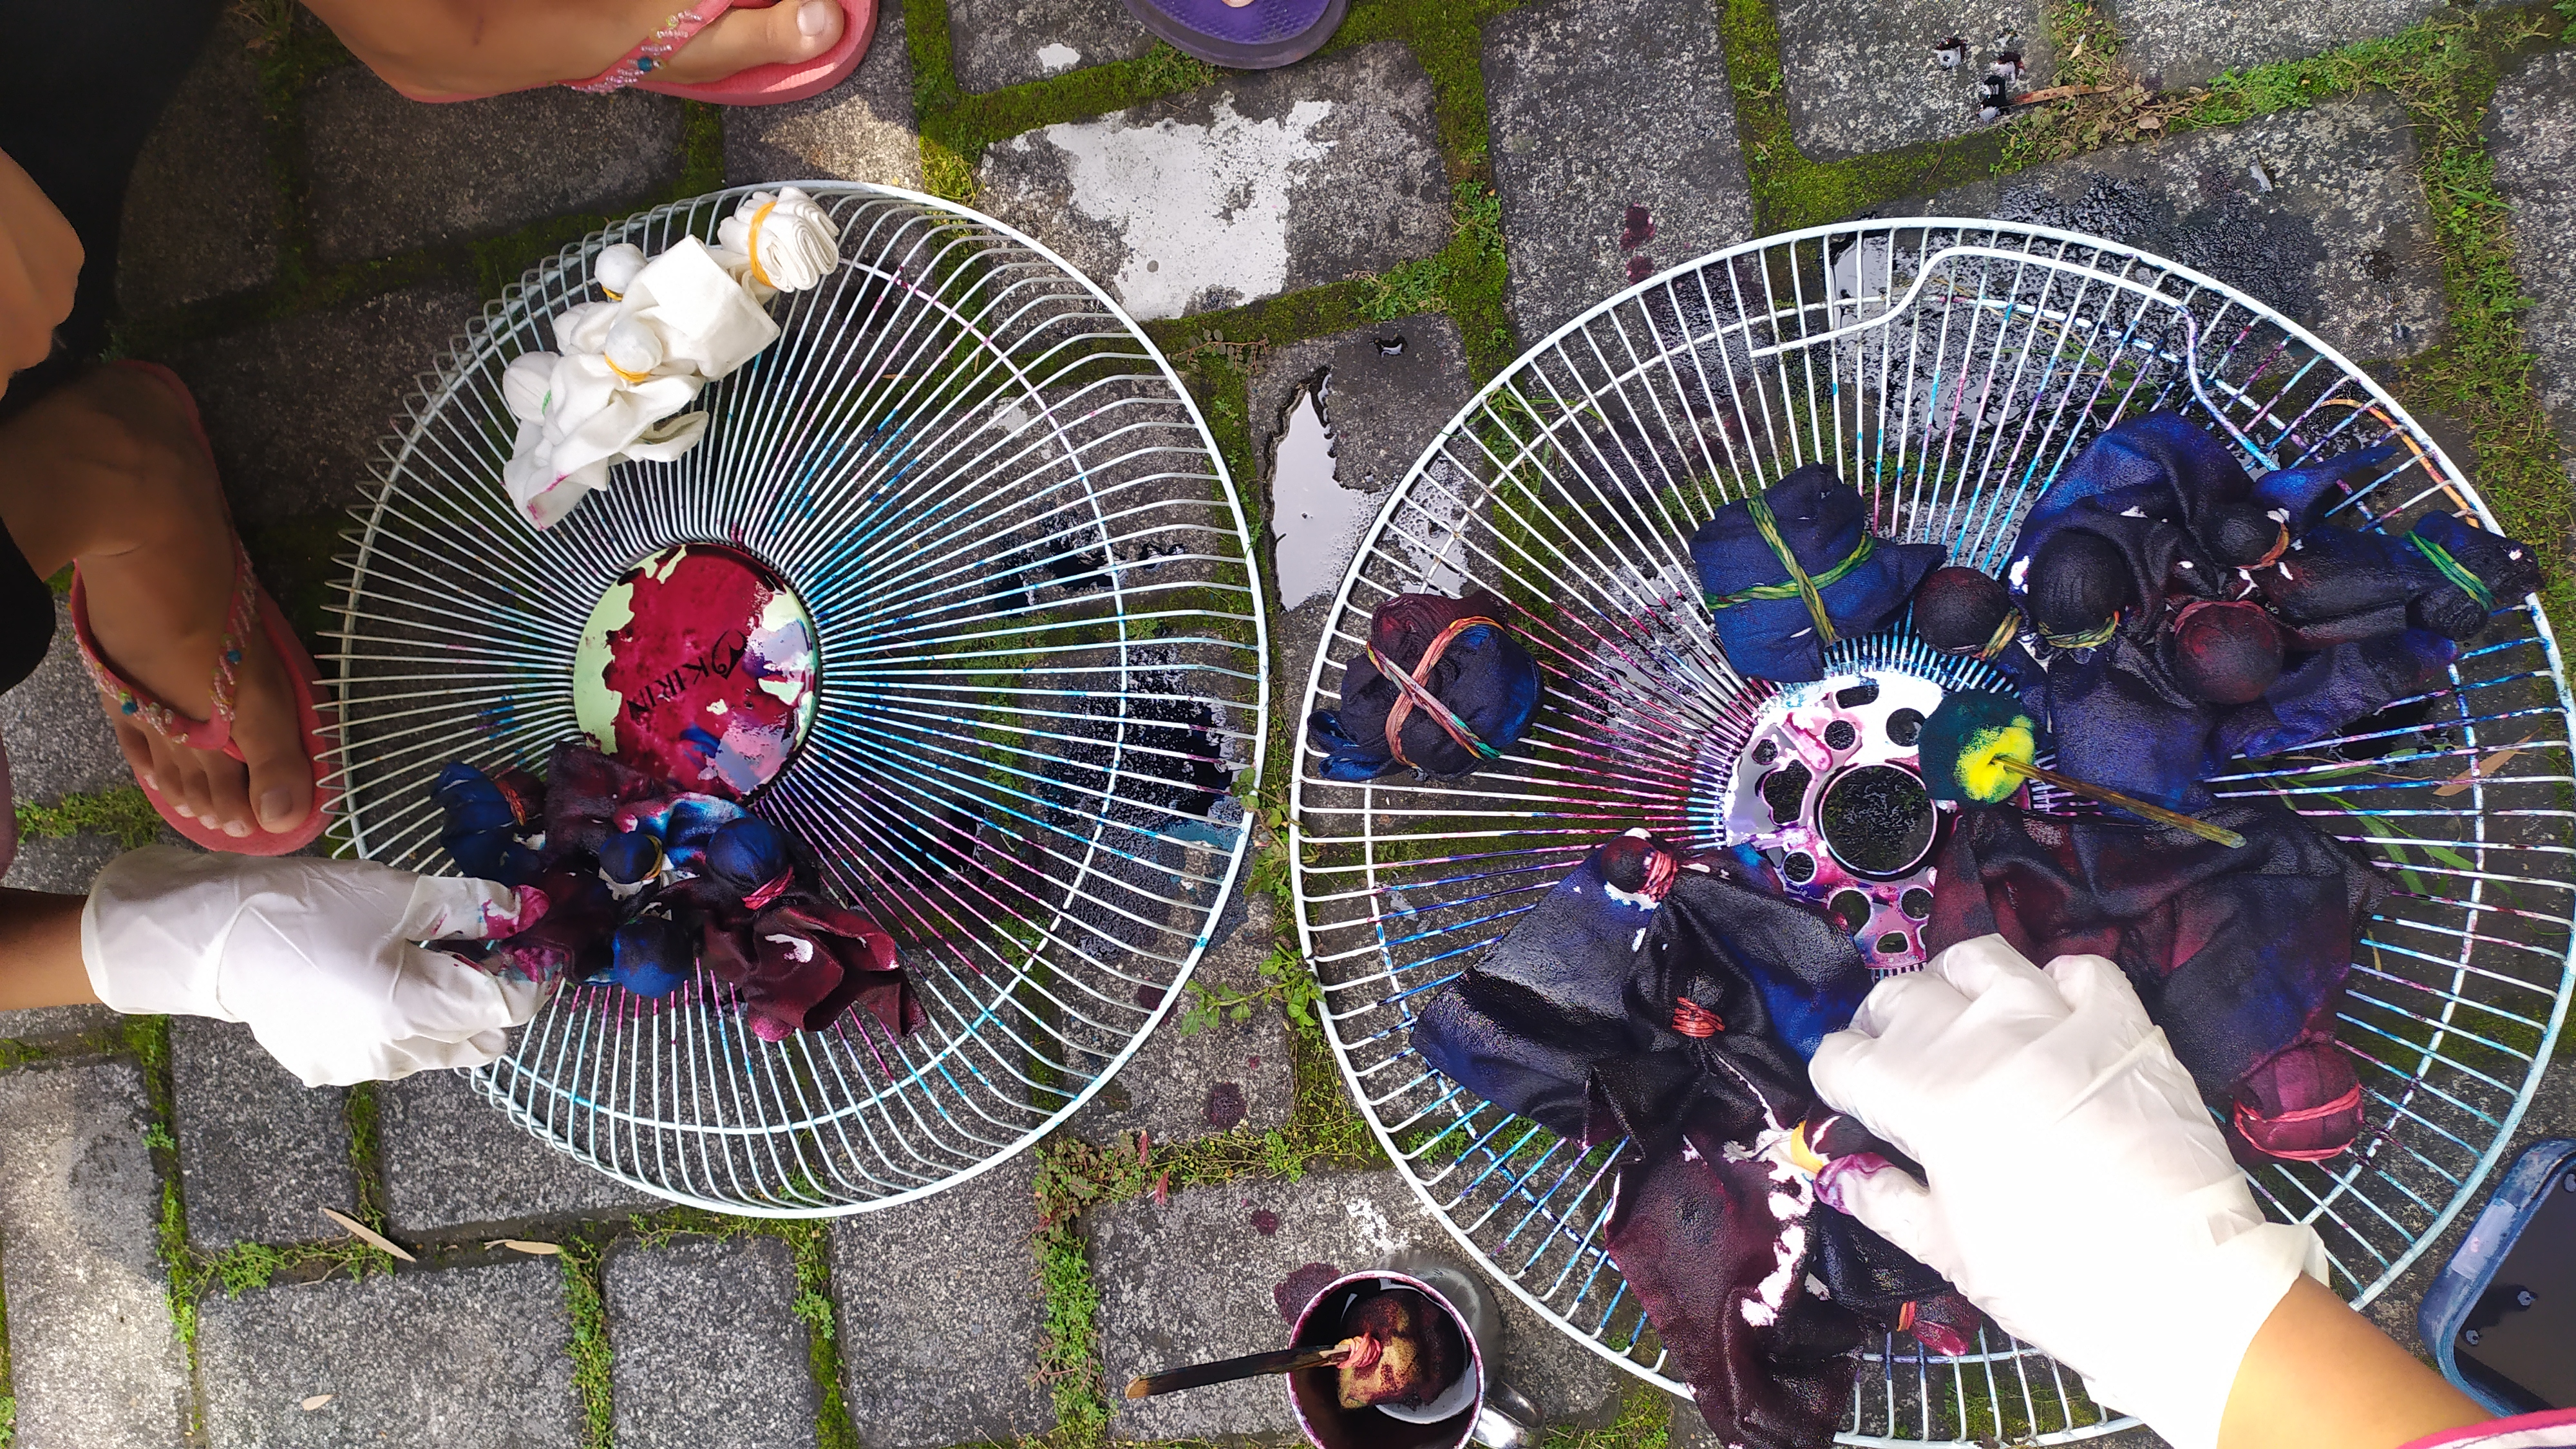 Proses pembuatan batik jumput oleh mahasiswa KKN UM Desa Senggreng 2020